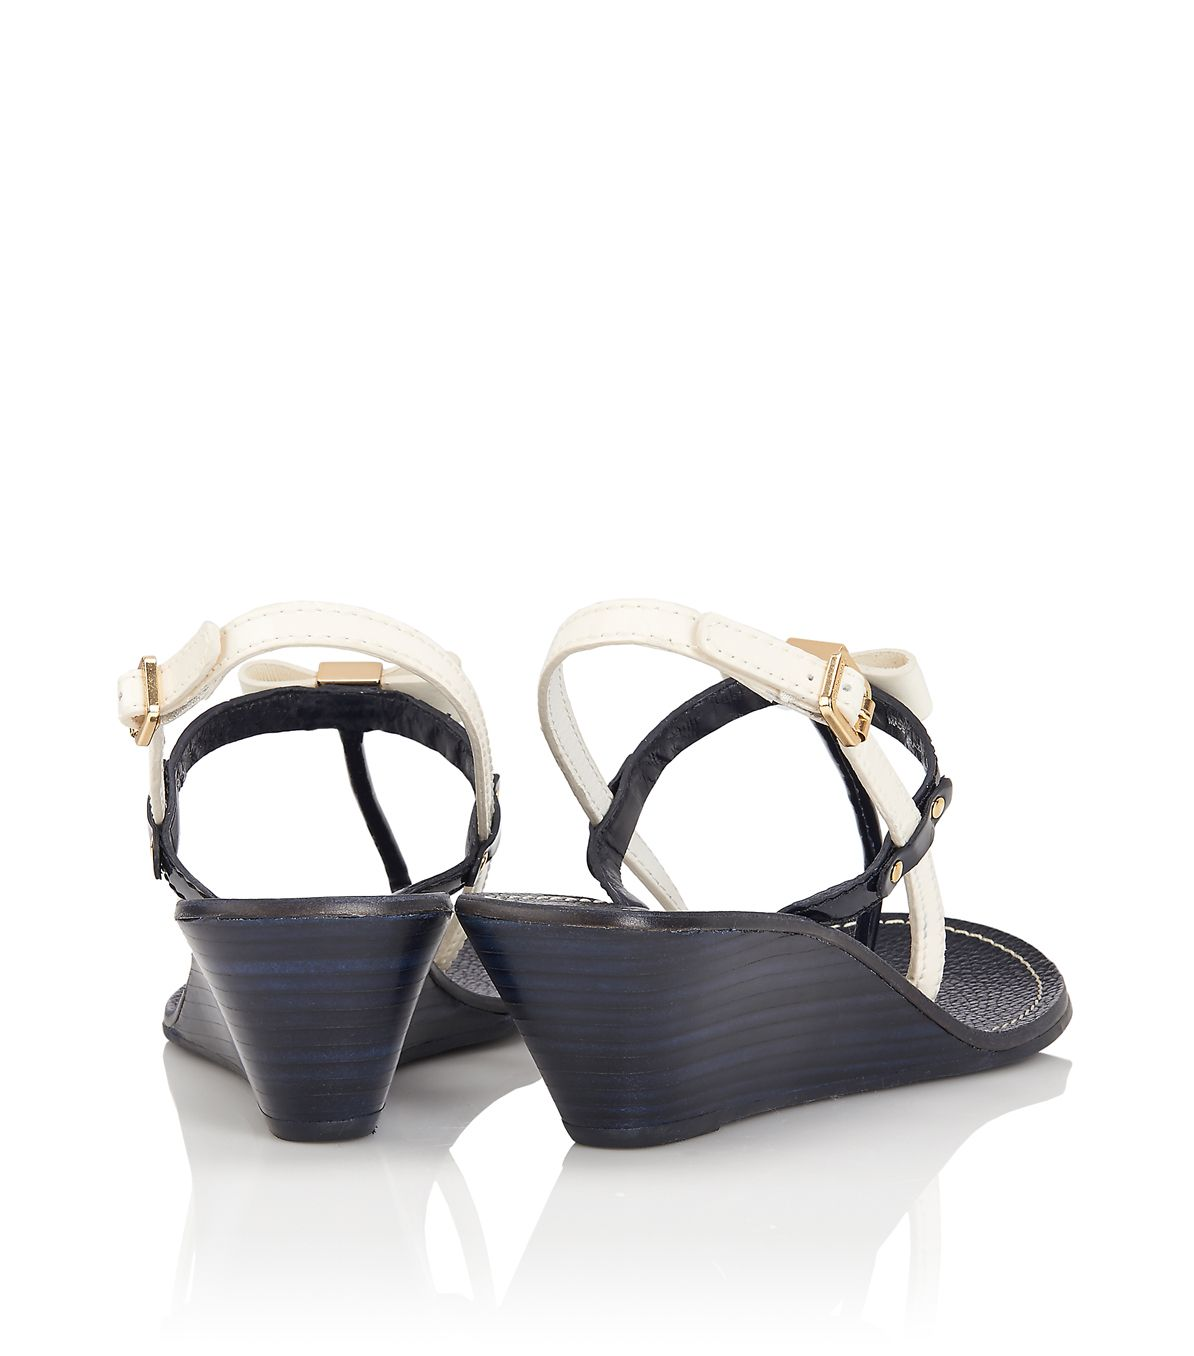 6d248ed2e975 Lyst - Tory Burch Kailey Wedge Thong Sandal in Black